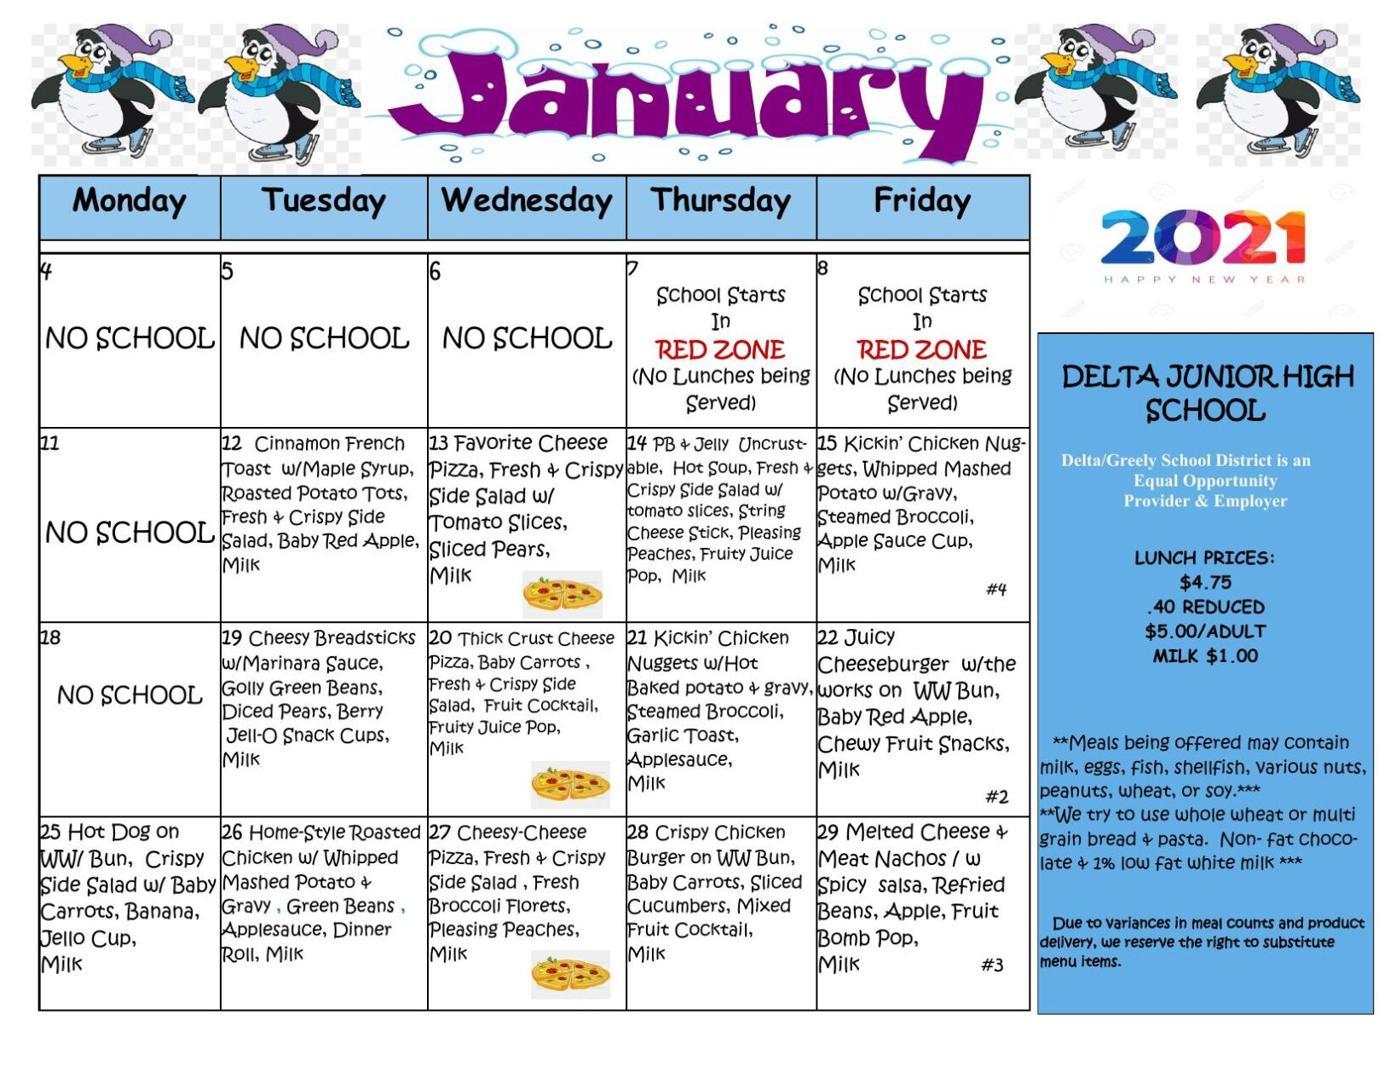 Delta Junior High School Lunch Menu Jan. 2021